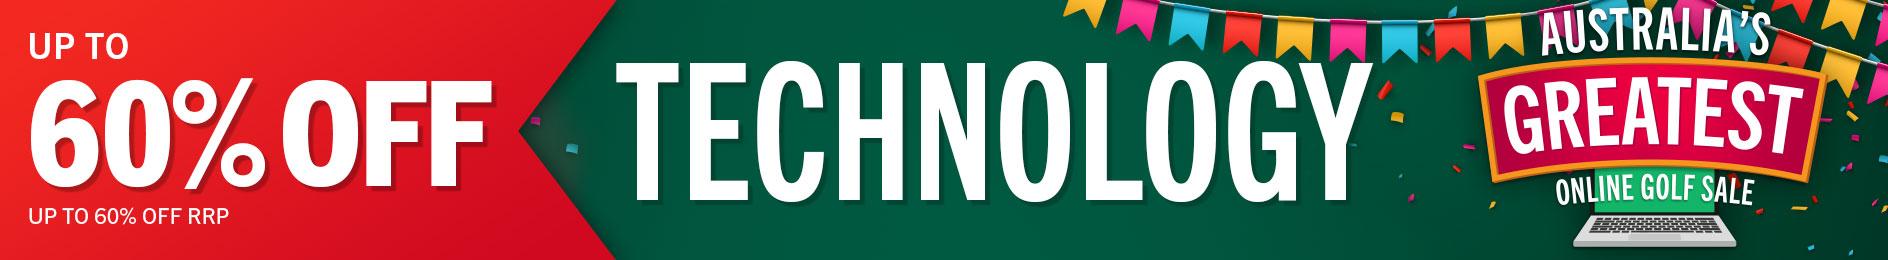 online-cat-banner-technology.jpg